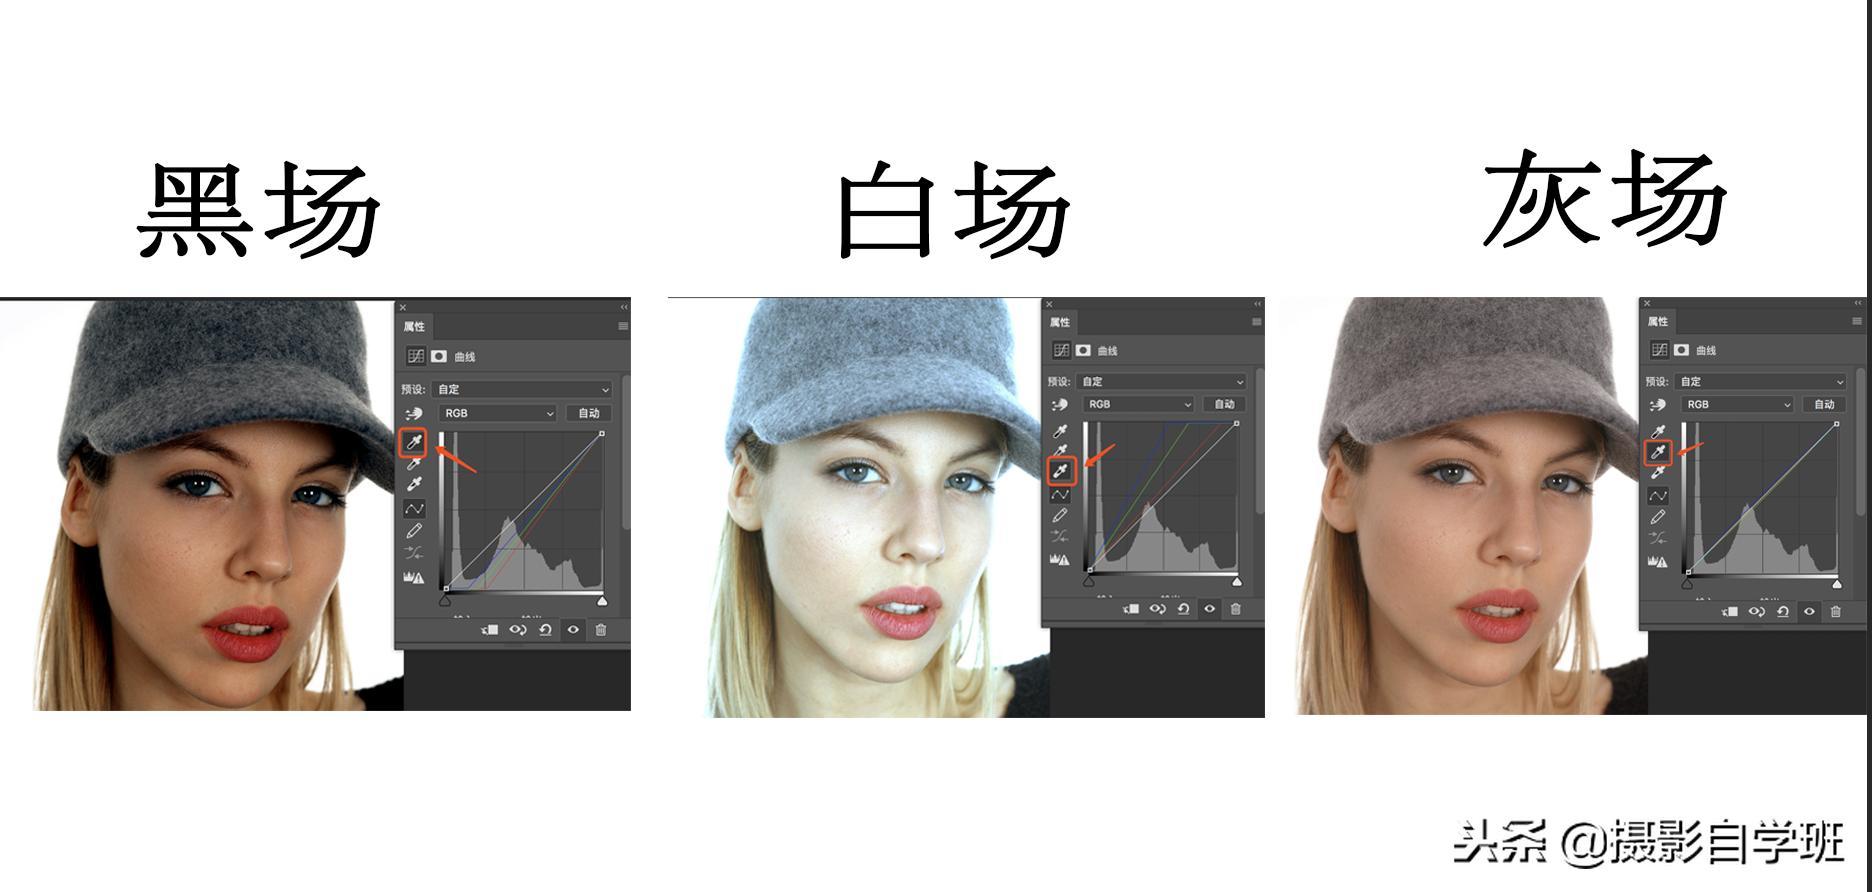 ps怎么美白肤色最自然(ps面部磨皮美白)插图(4)